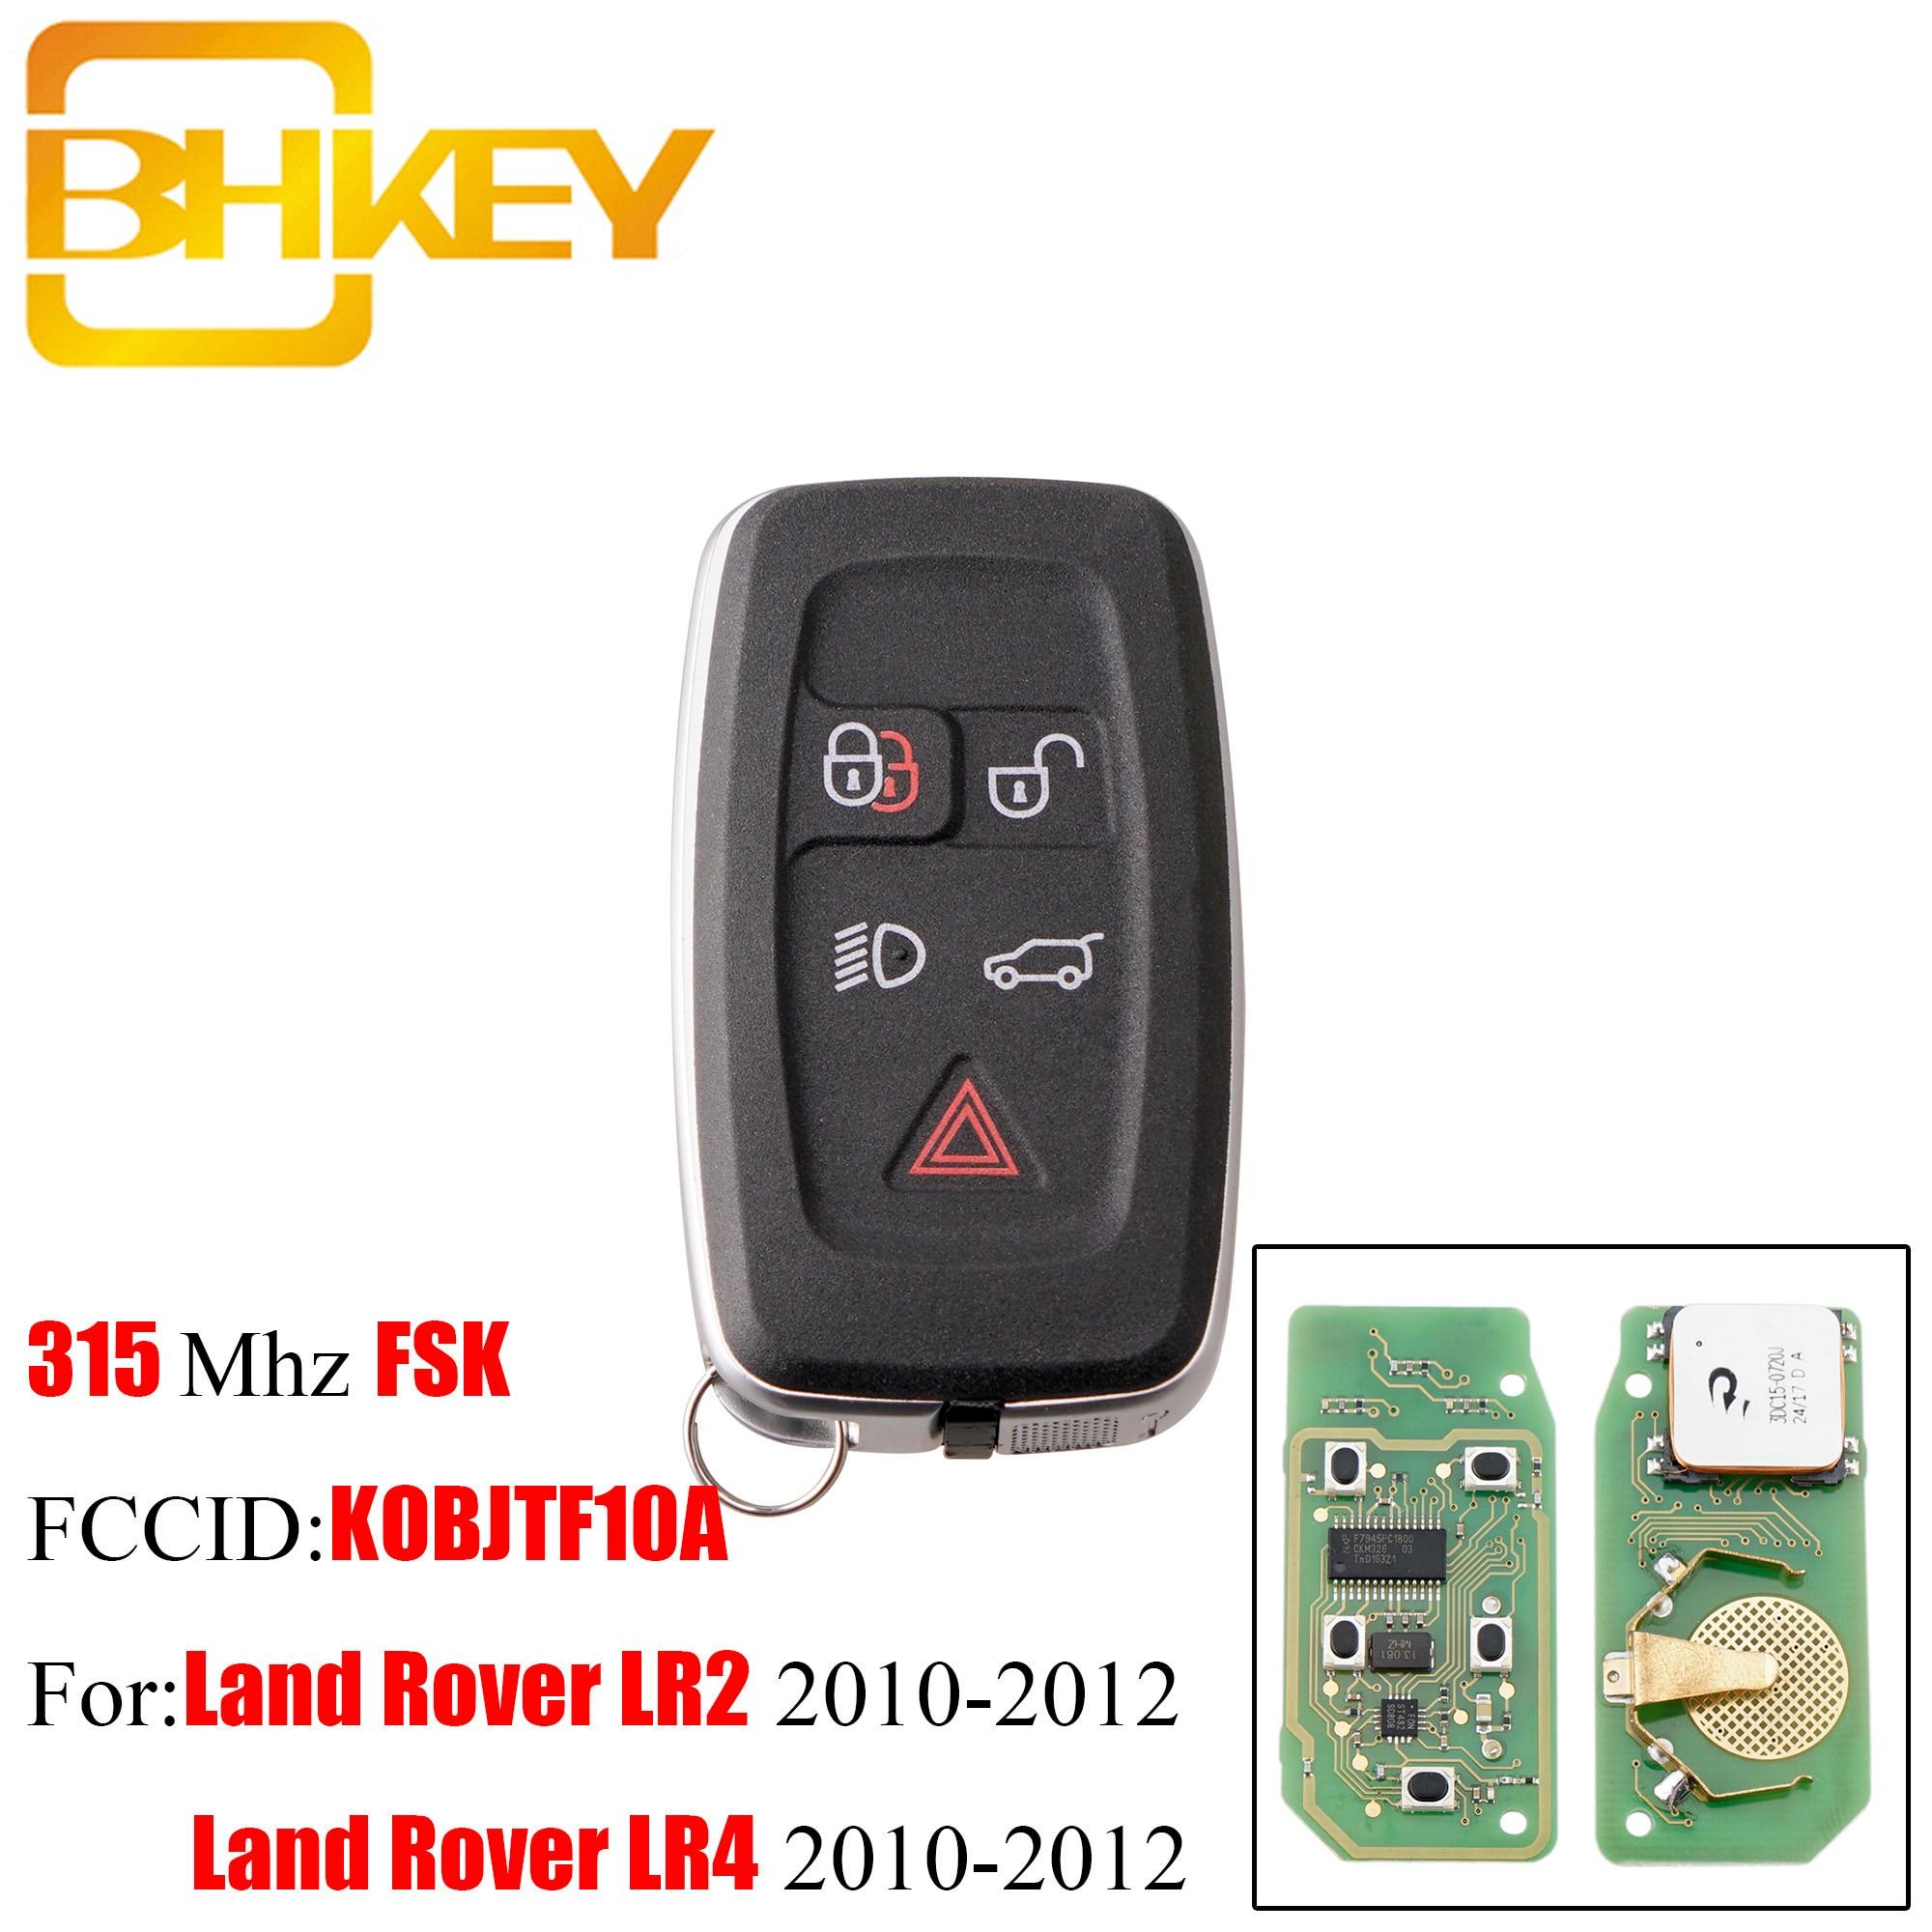 Set of 2 Evoque Range Rover Car Key Fob Keyless Entry Smart Remote fits Land Rover LR024070 Sport